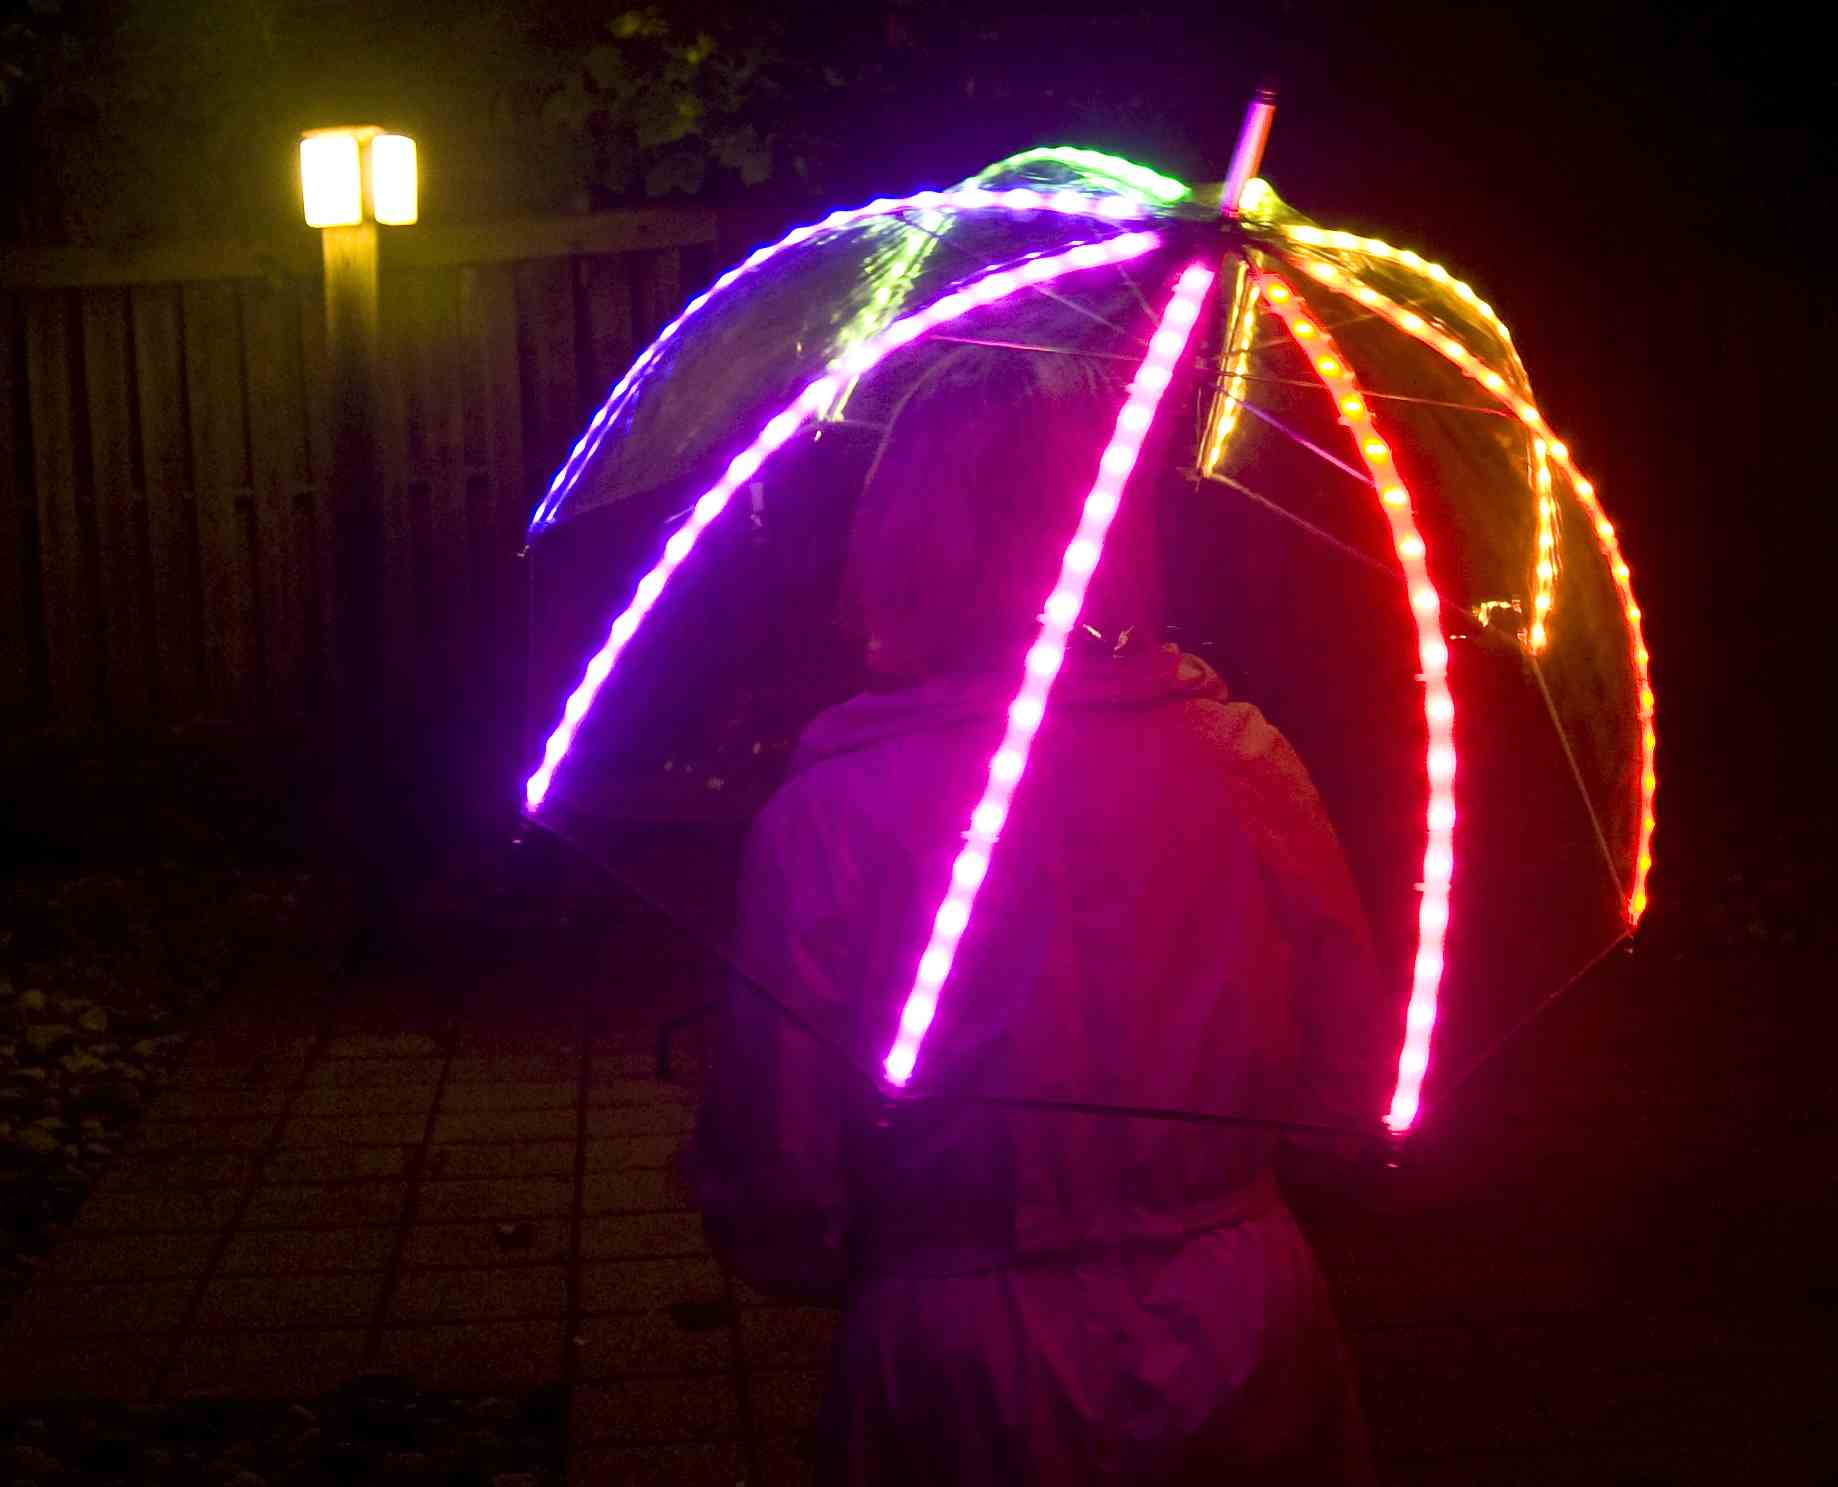 Led Umbrella Wins Wearable Electronics Prize